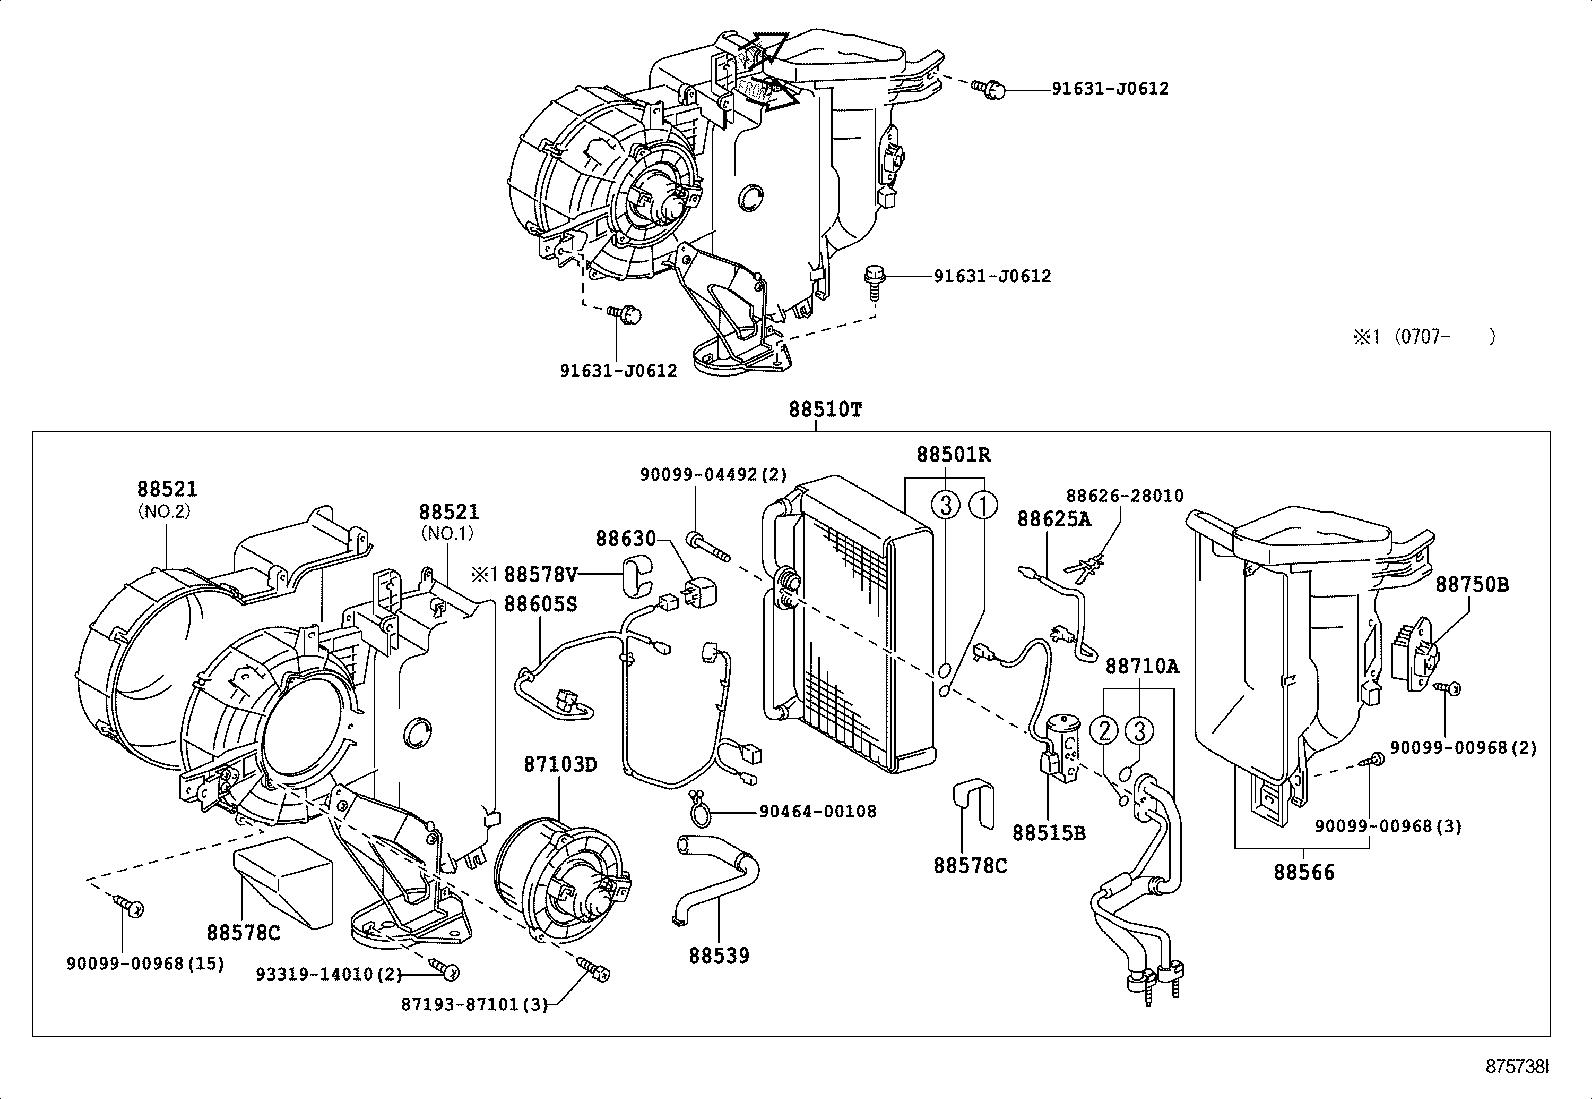 1972 fj40 wiring diagram e36 stereo harness fuse box elsavadorla